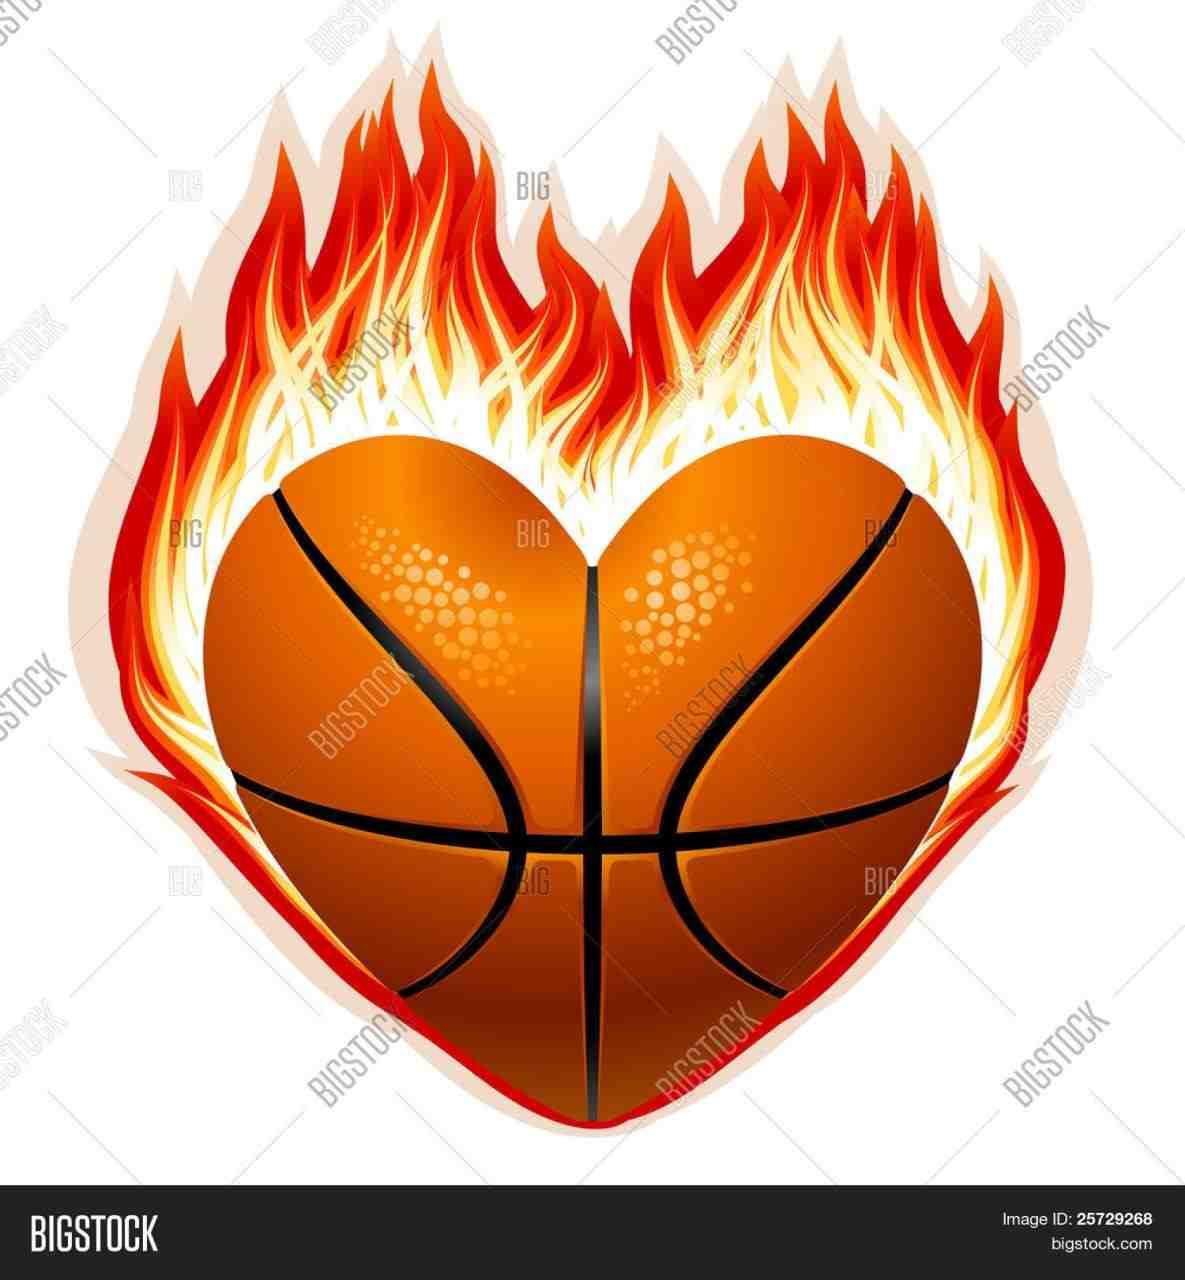 Basketball clipart flame. Logo of ball template